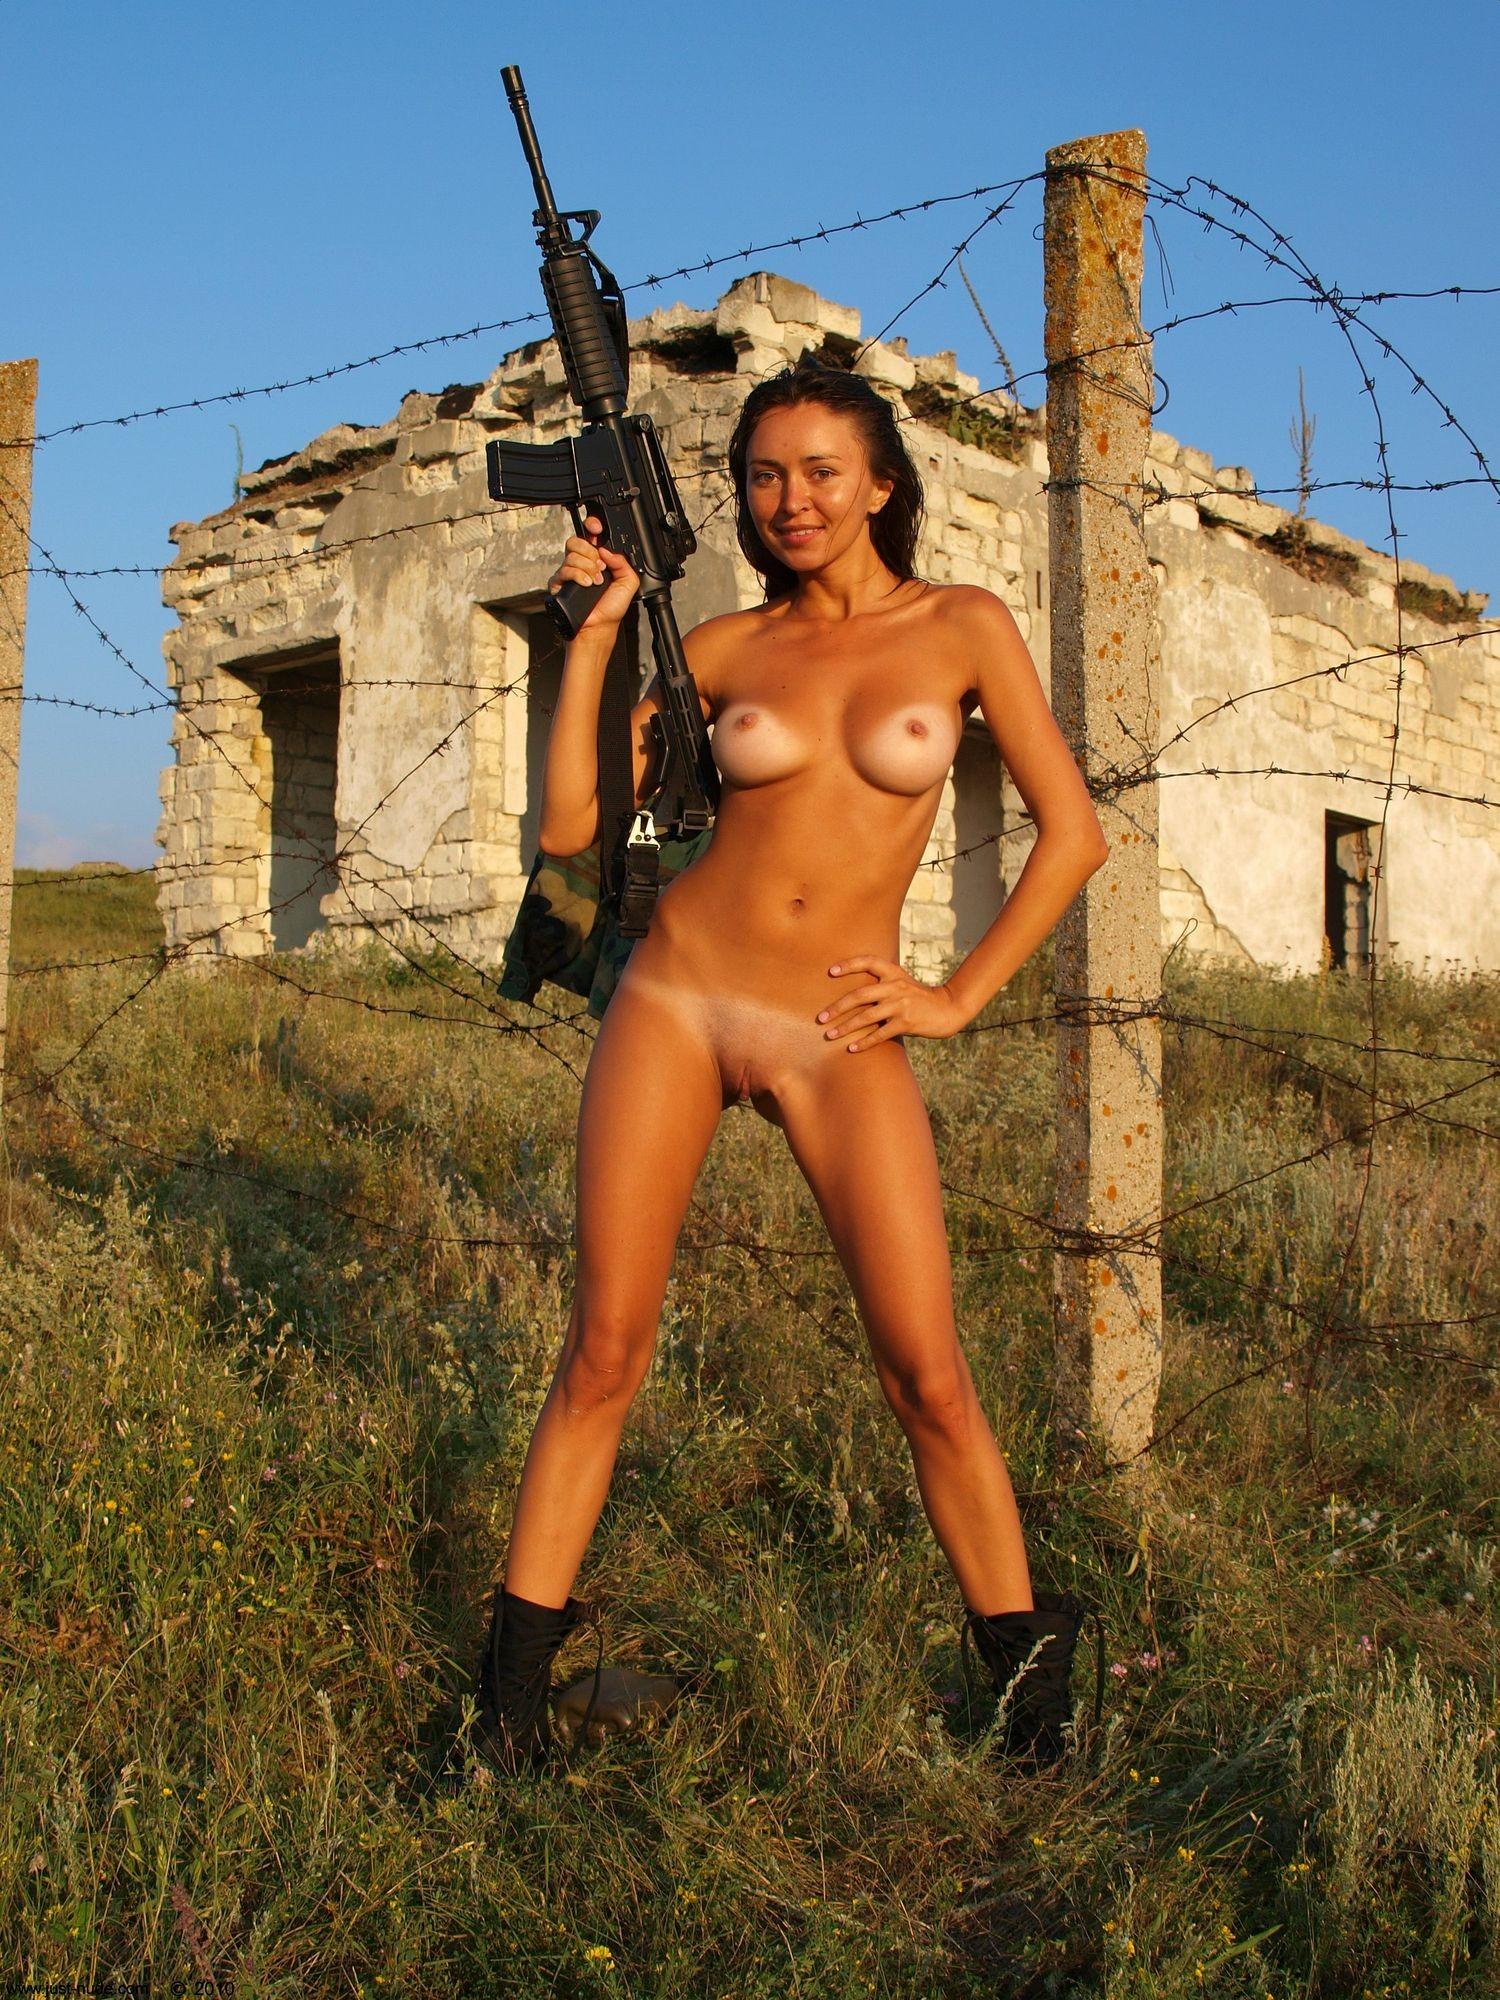 Blow job malay nude